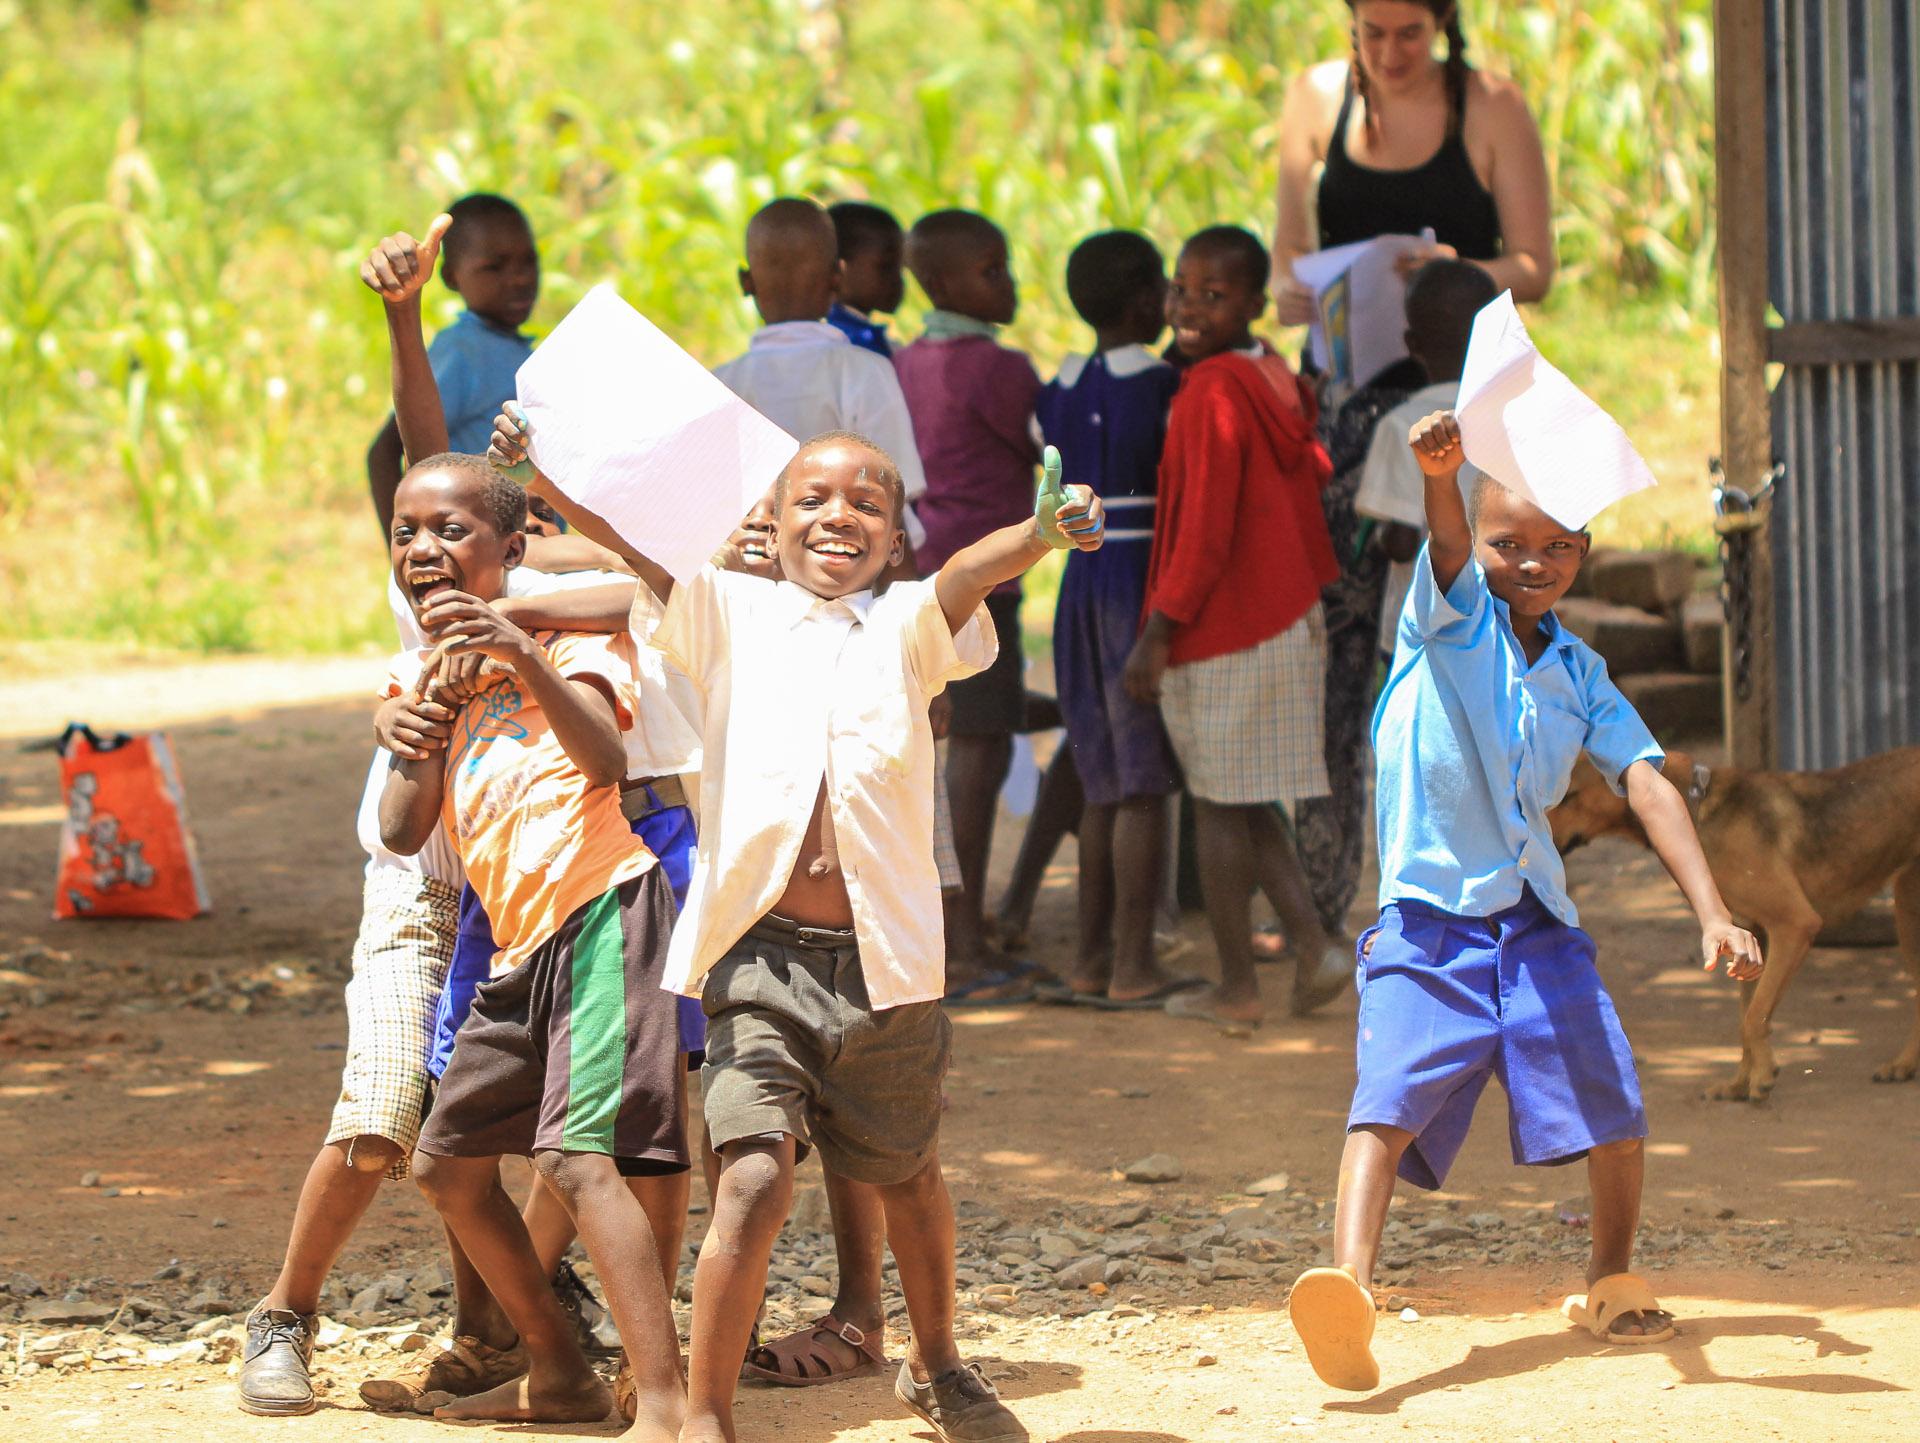 Volunteer in Kenya – I Simply Feel Part Of The Korando Family